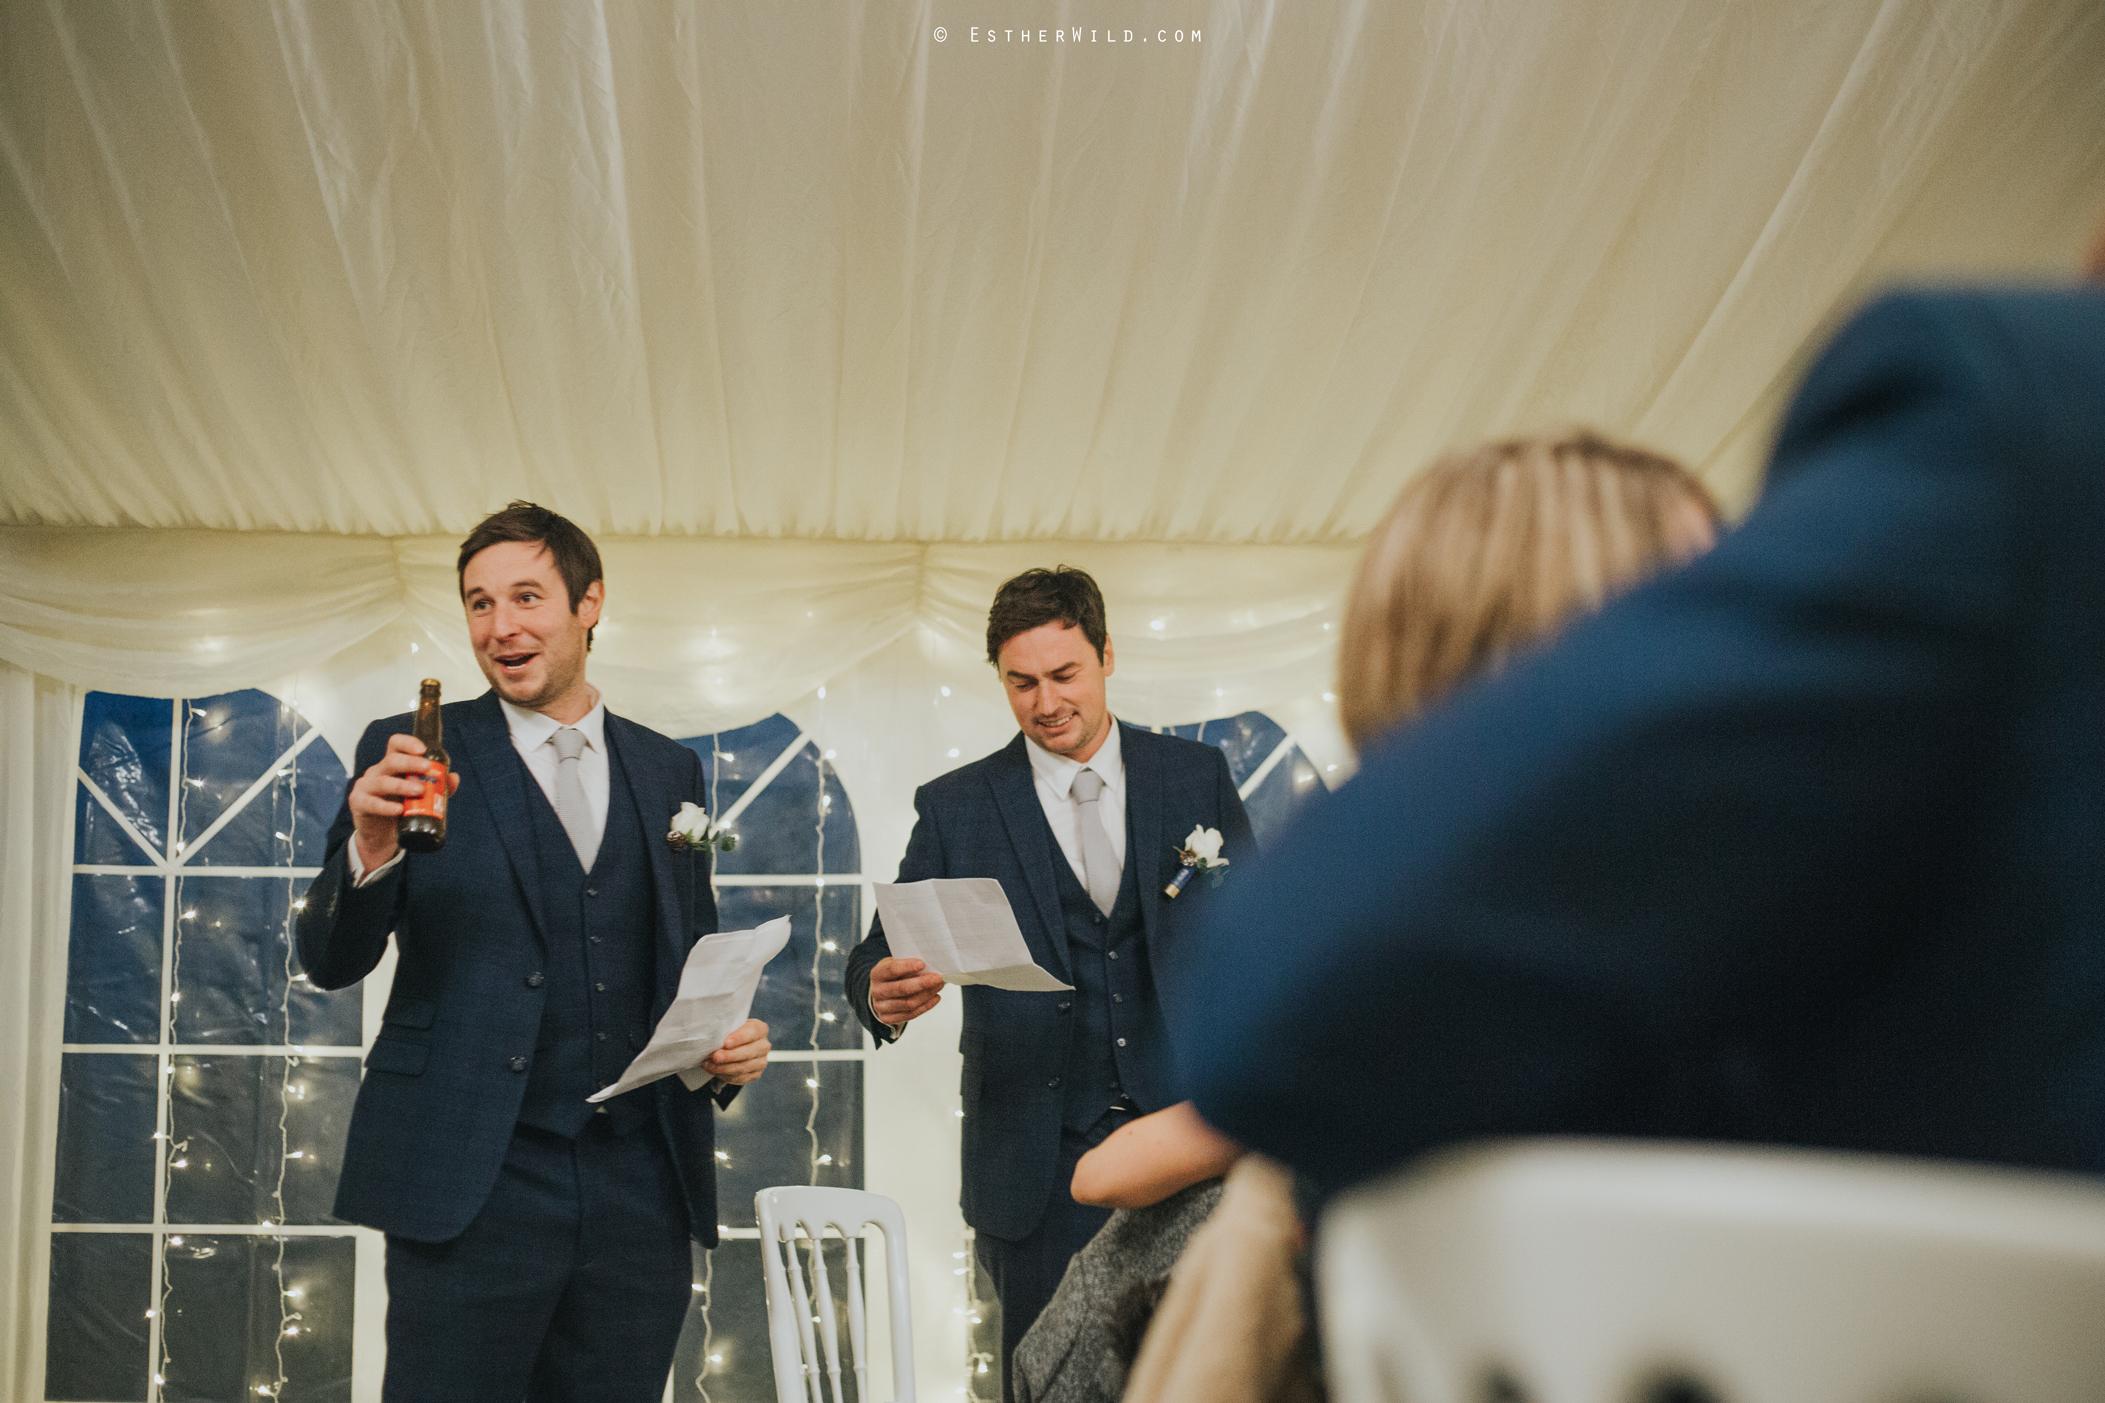 Wedding_Photography_Diss_Gawdy_Hall_Redenhall_Church_Norfolk_Winter_Esther_Wild_Copyright_IMG_2112_IMGL1695.jpg